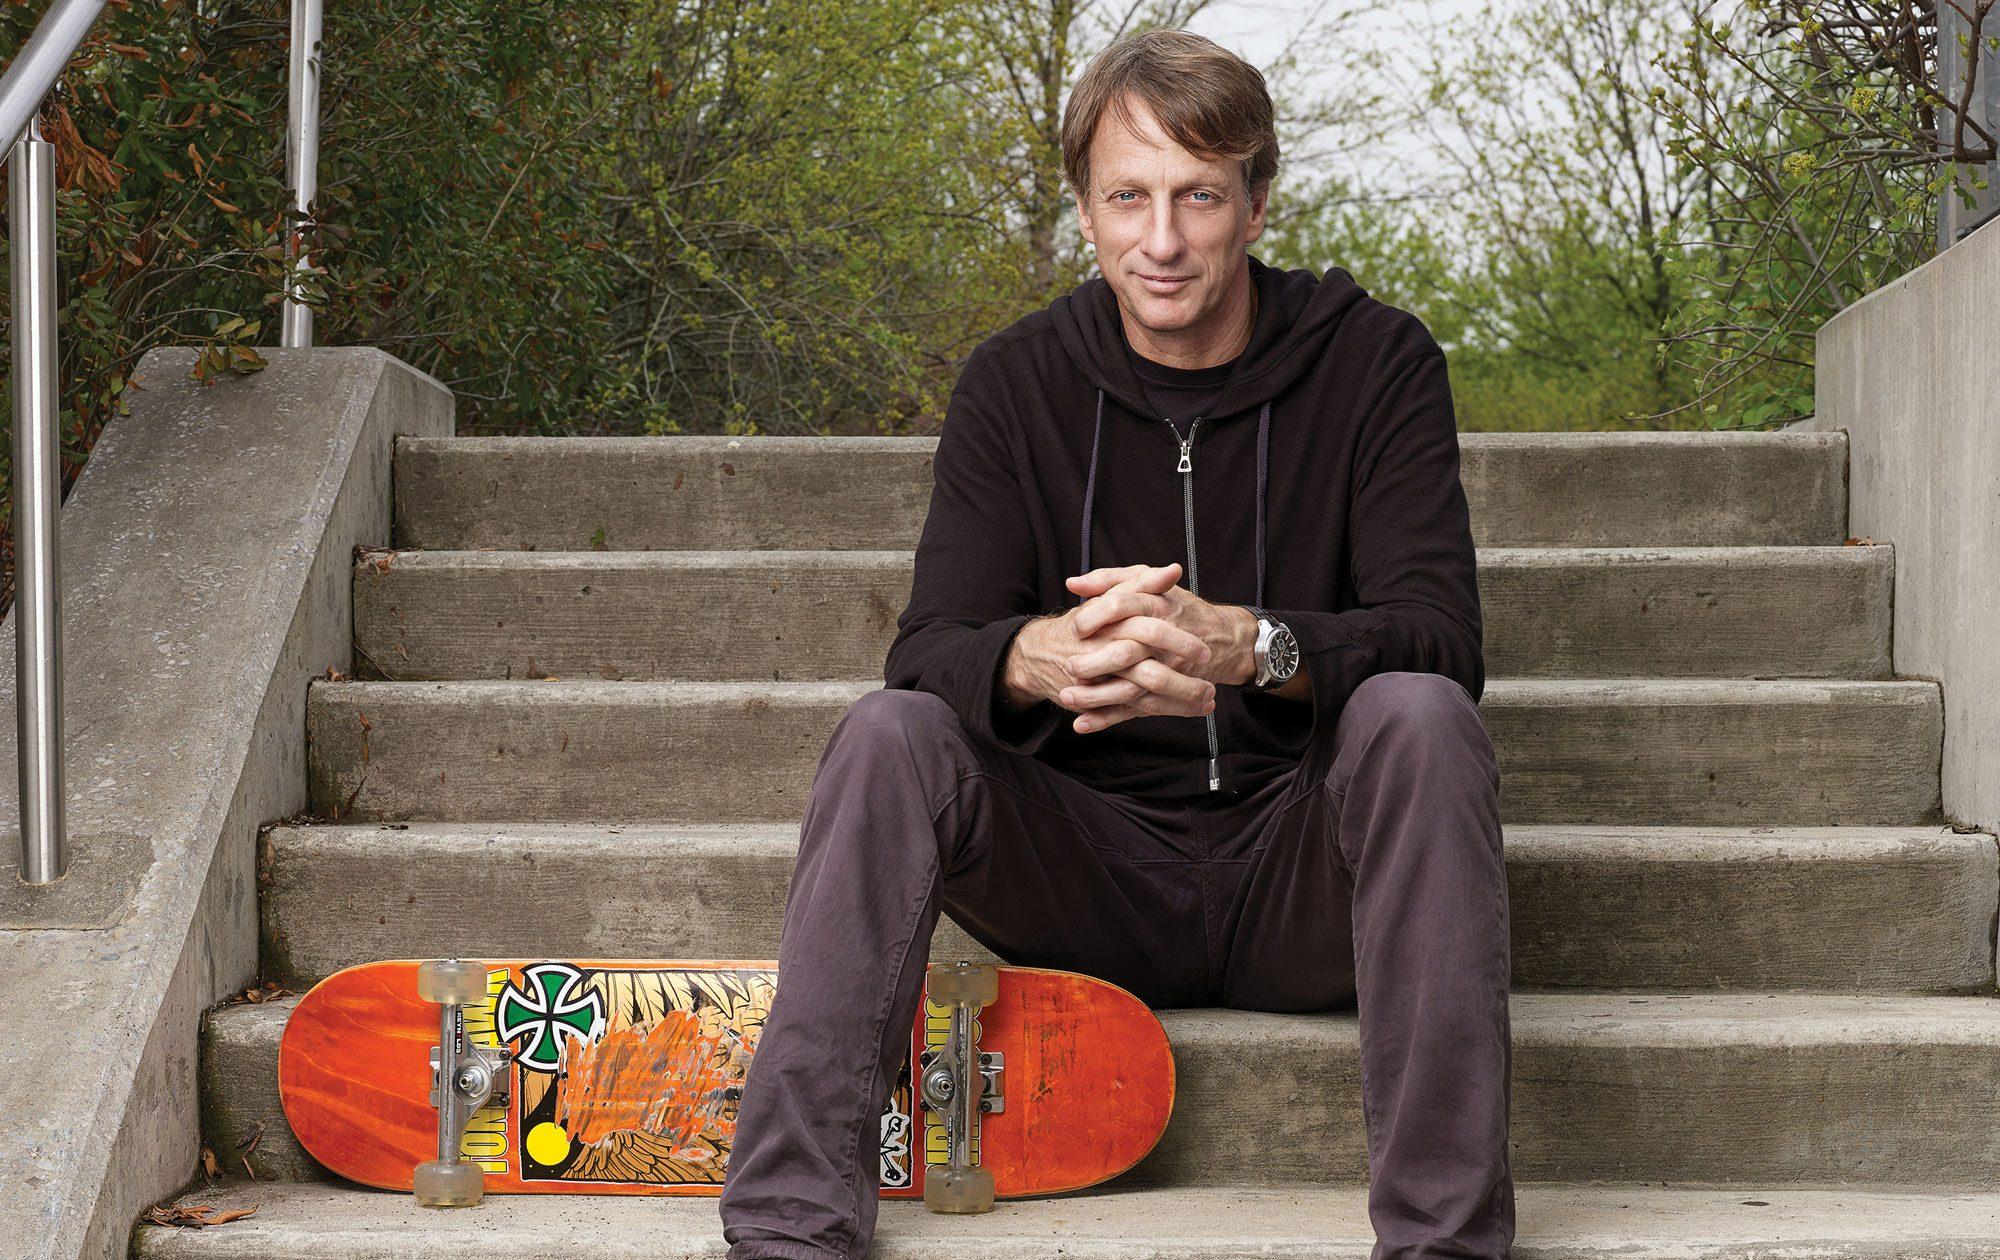 Skateboarding spencer hawk Tony Hawk